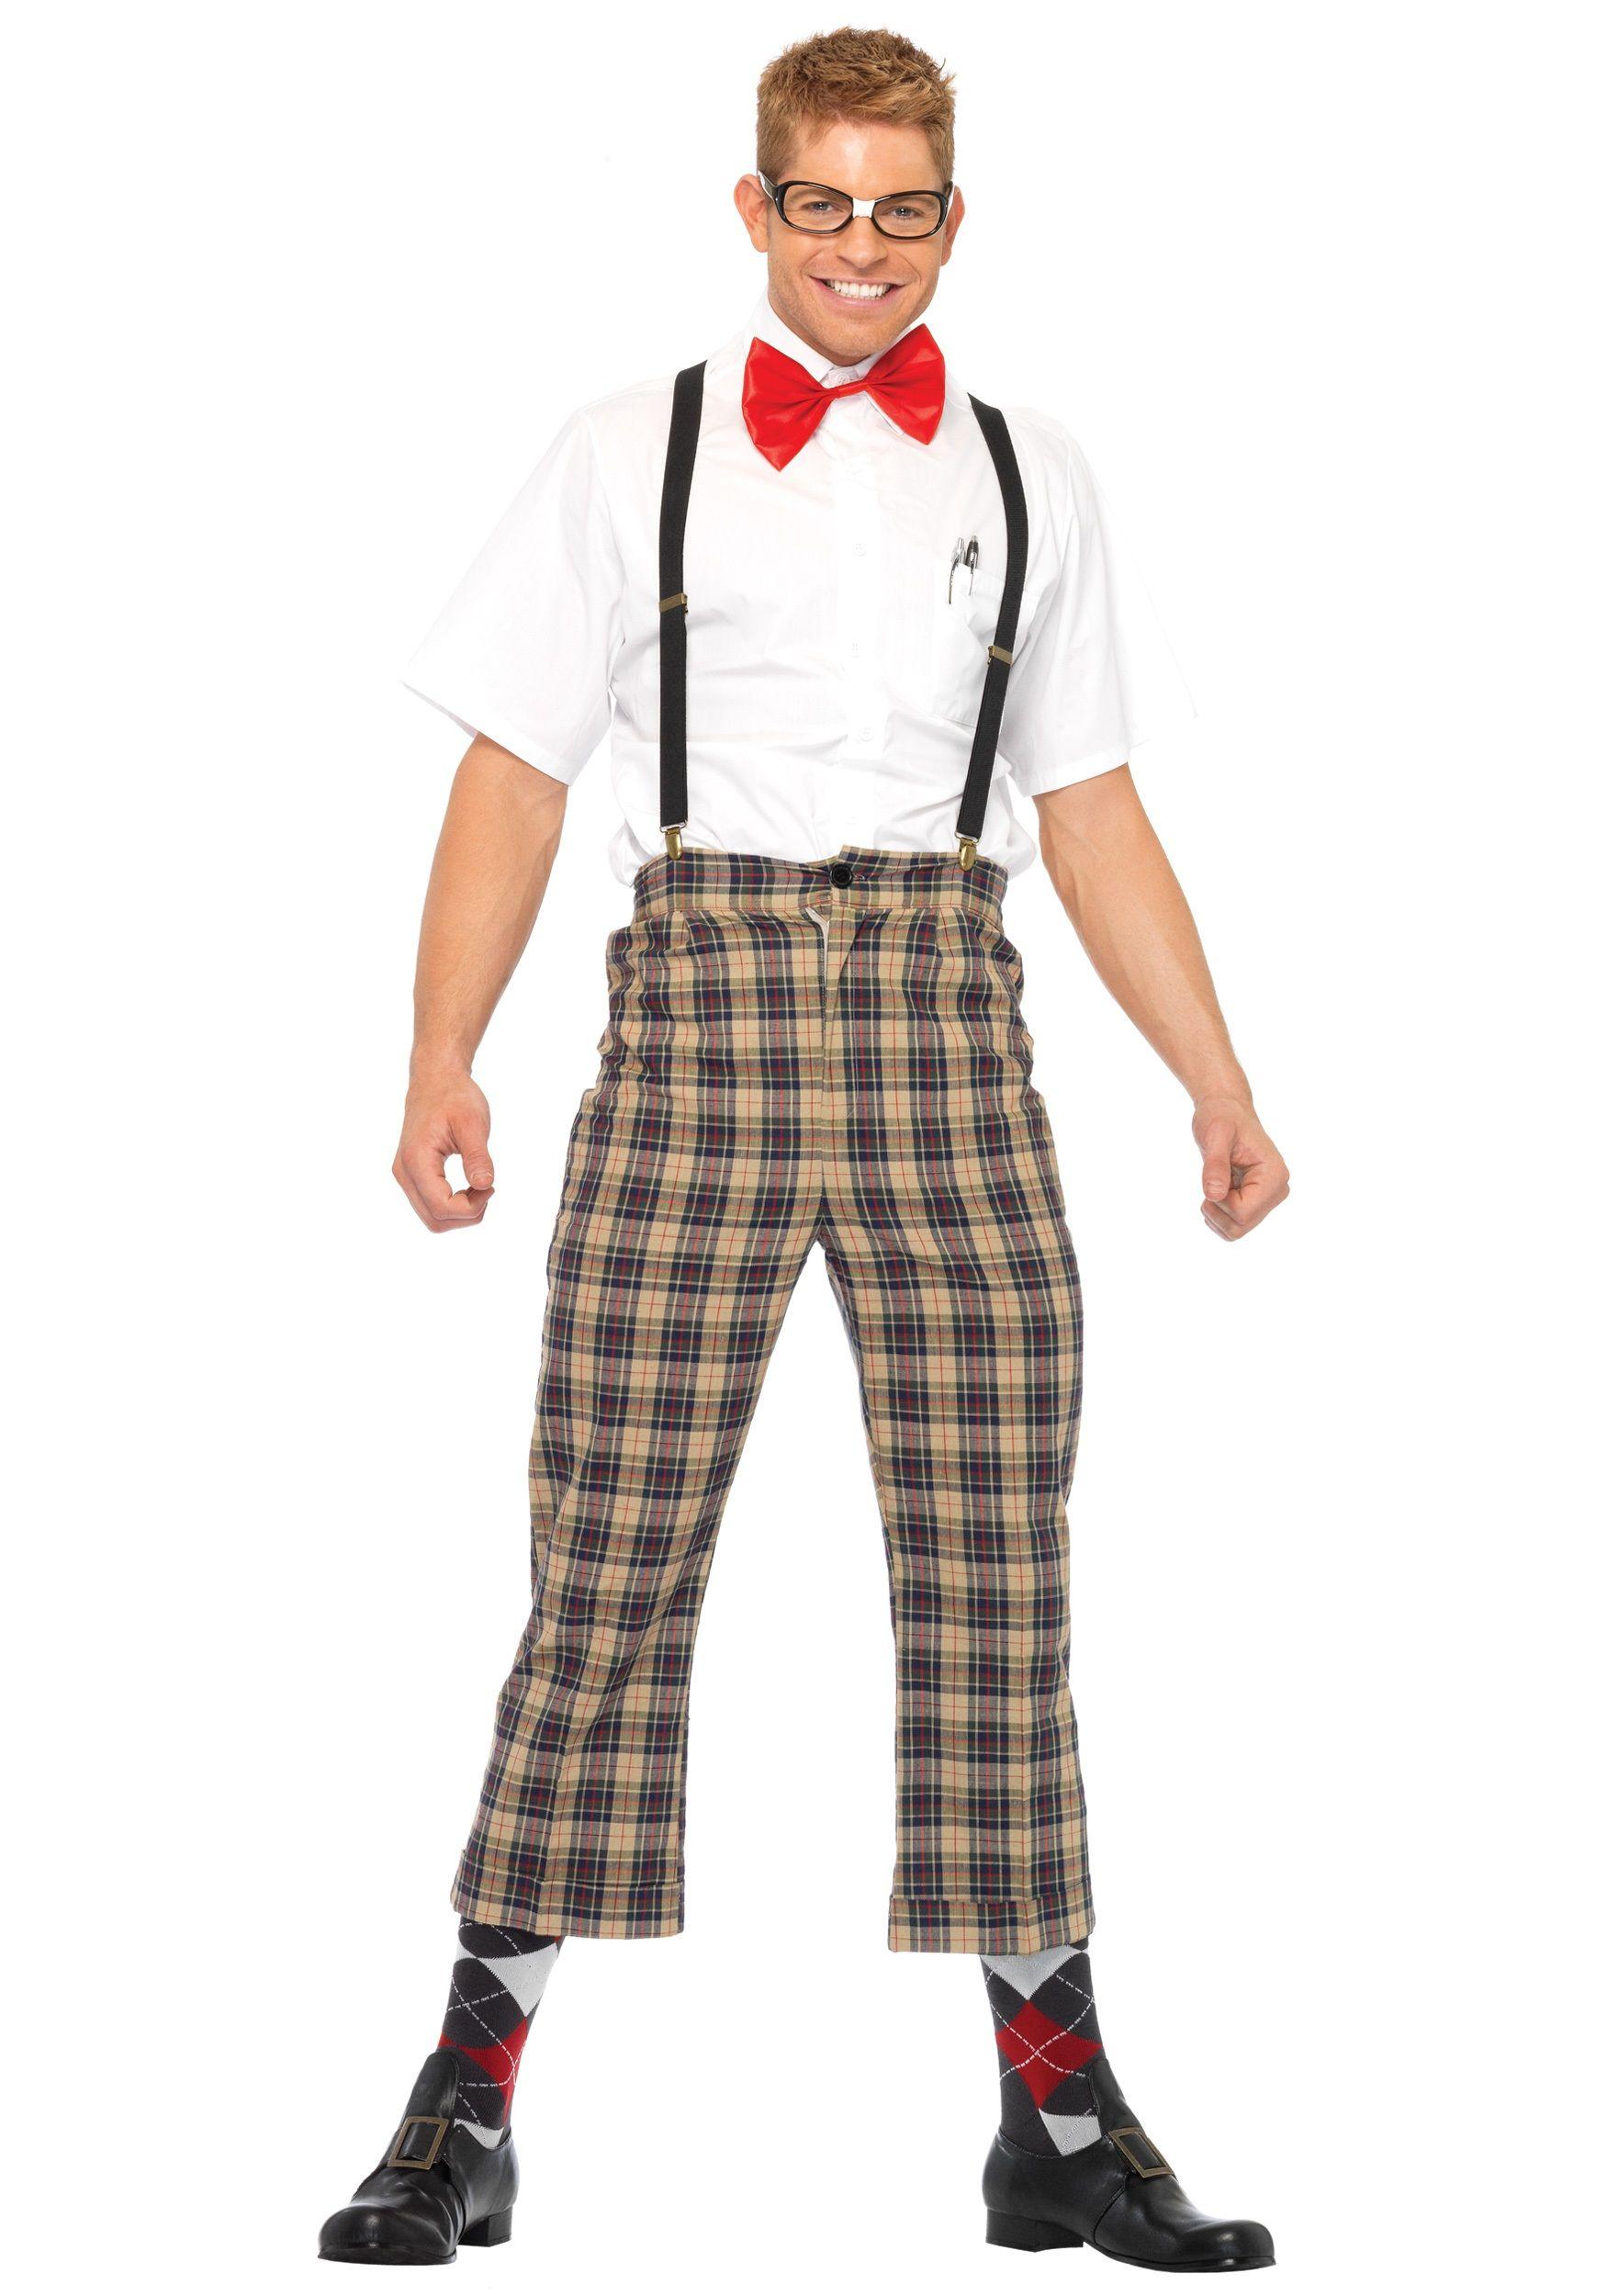 funny male halloween costume ideas Nerd Outfits Nerd